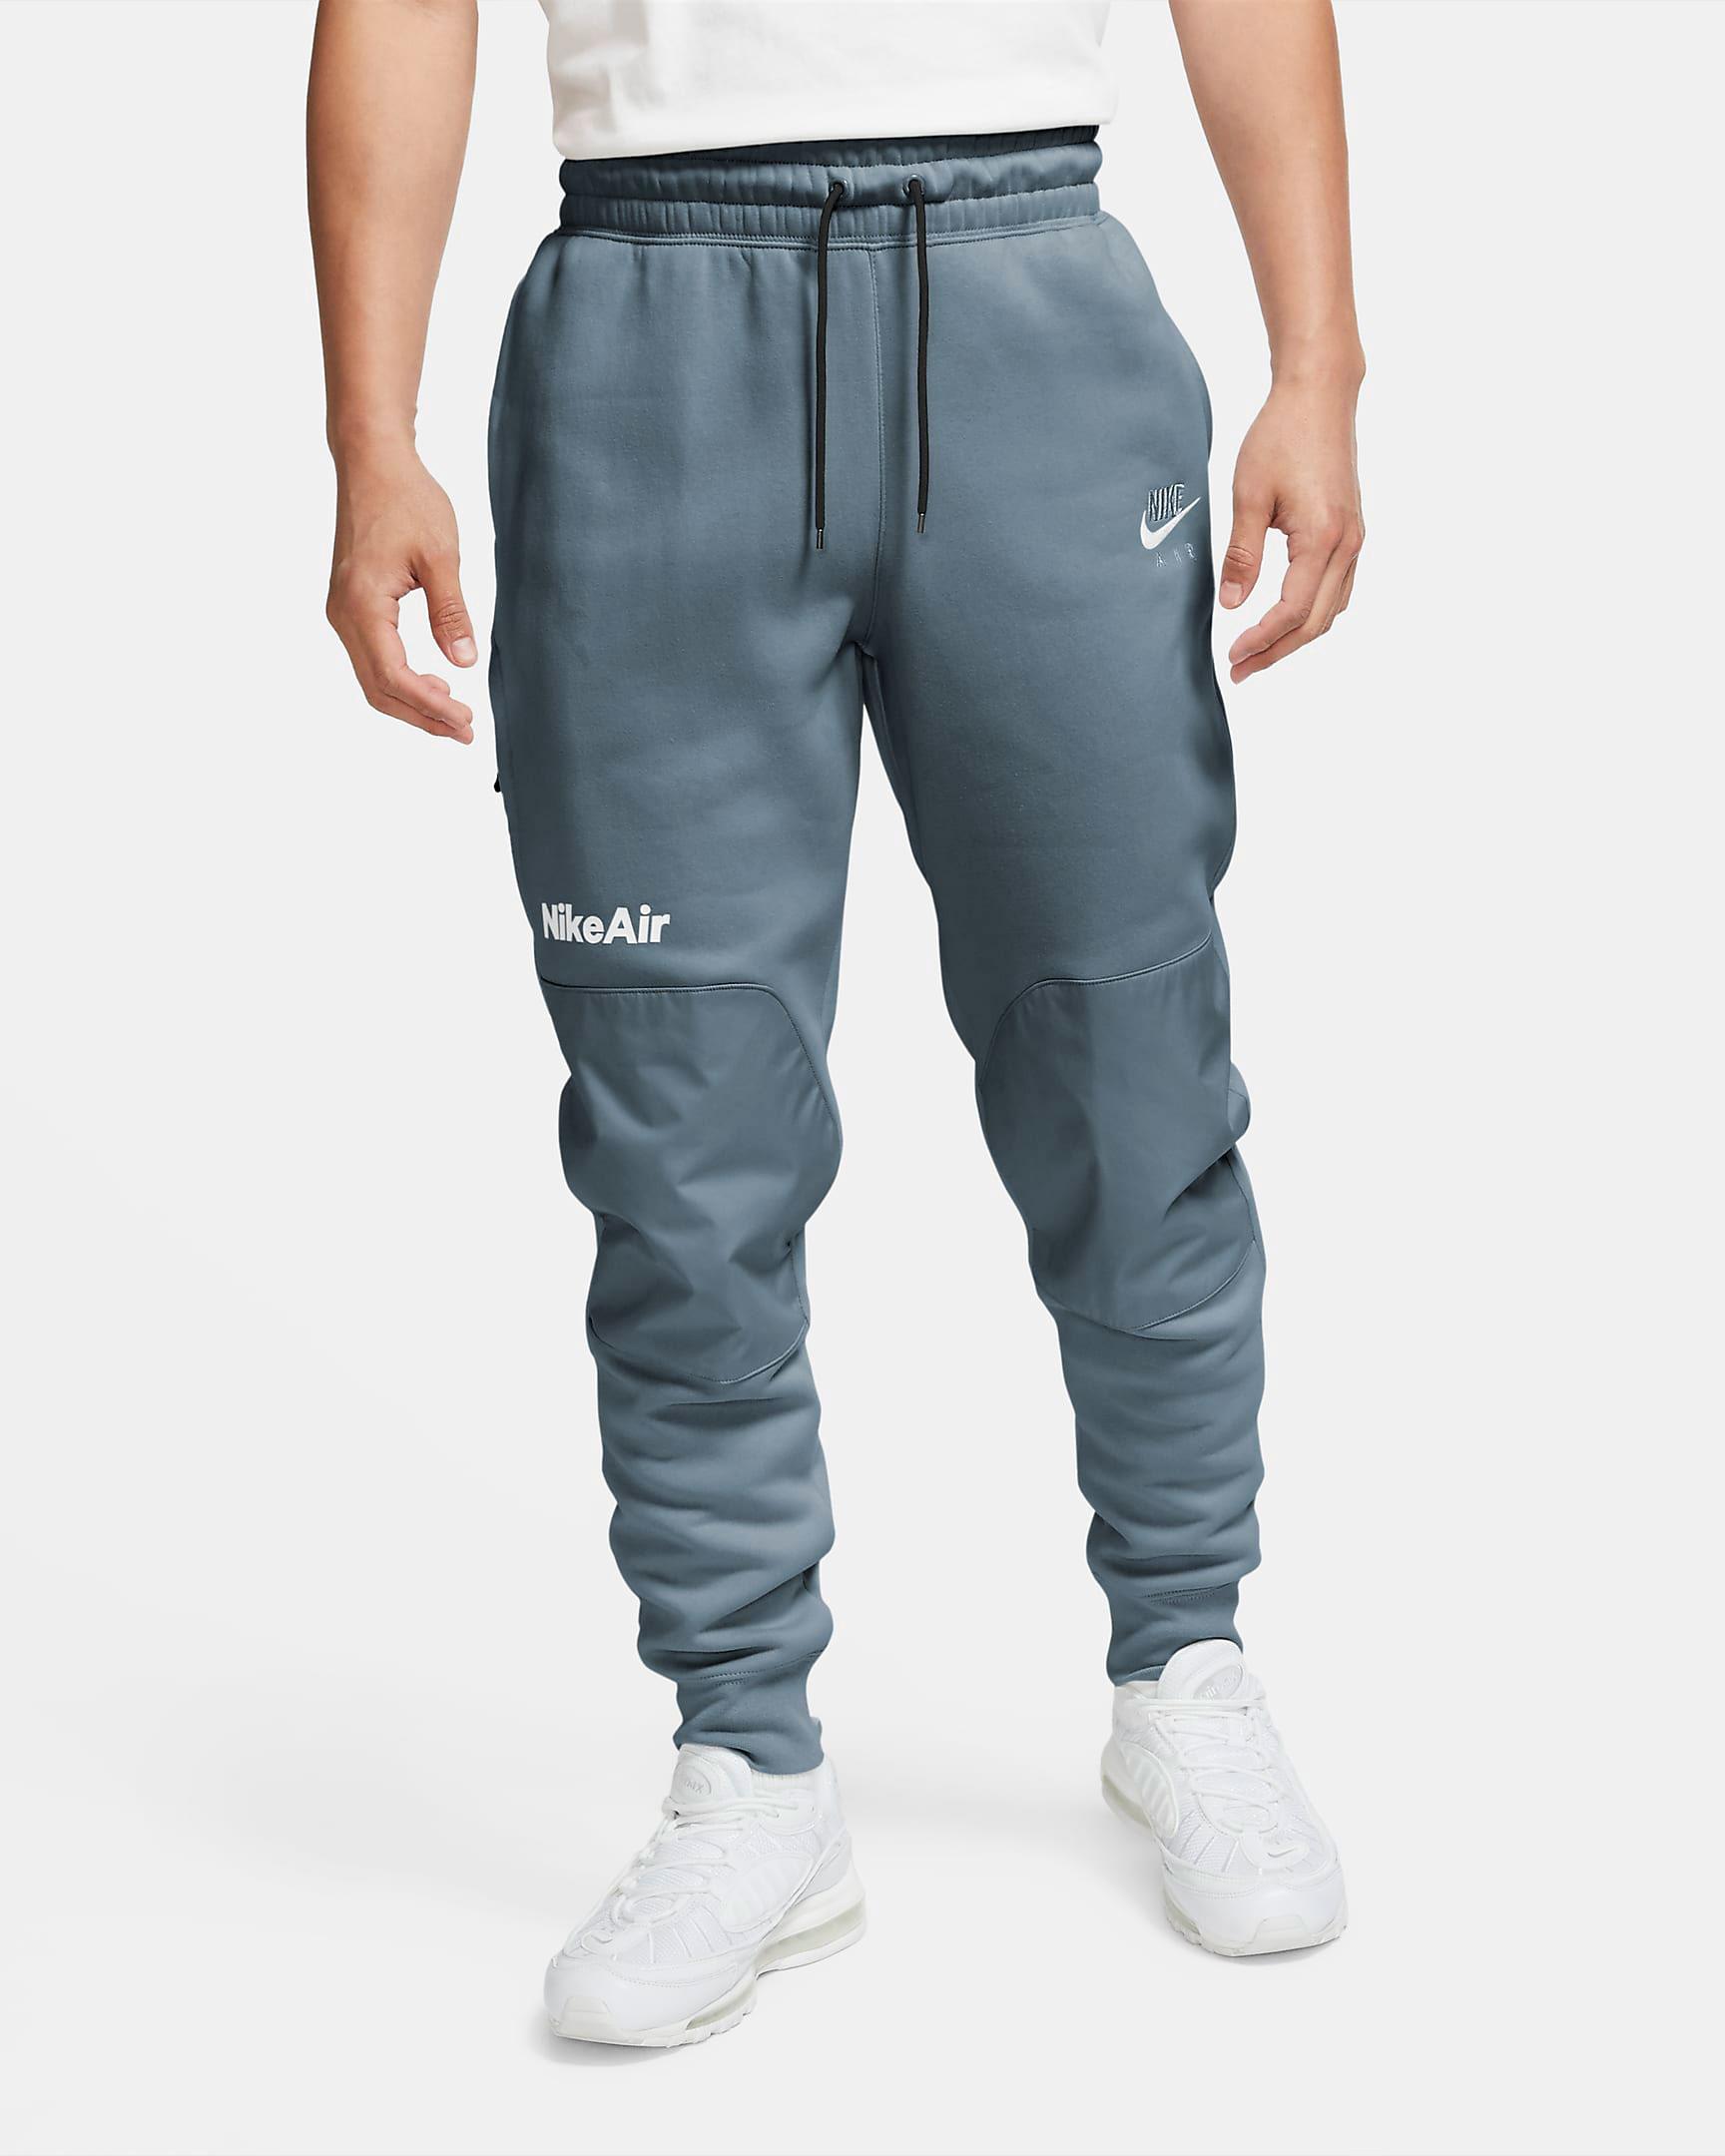 nike-air-fleece-pants-ozone-blue